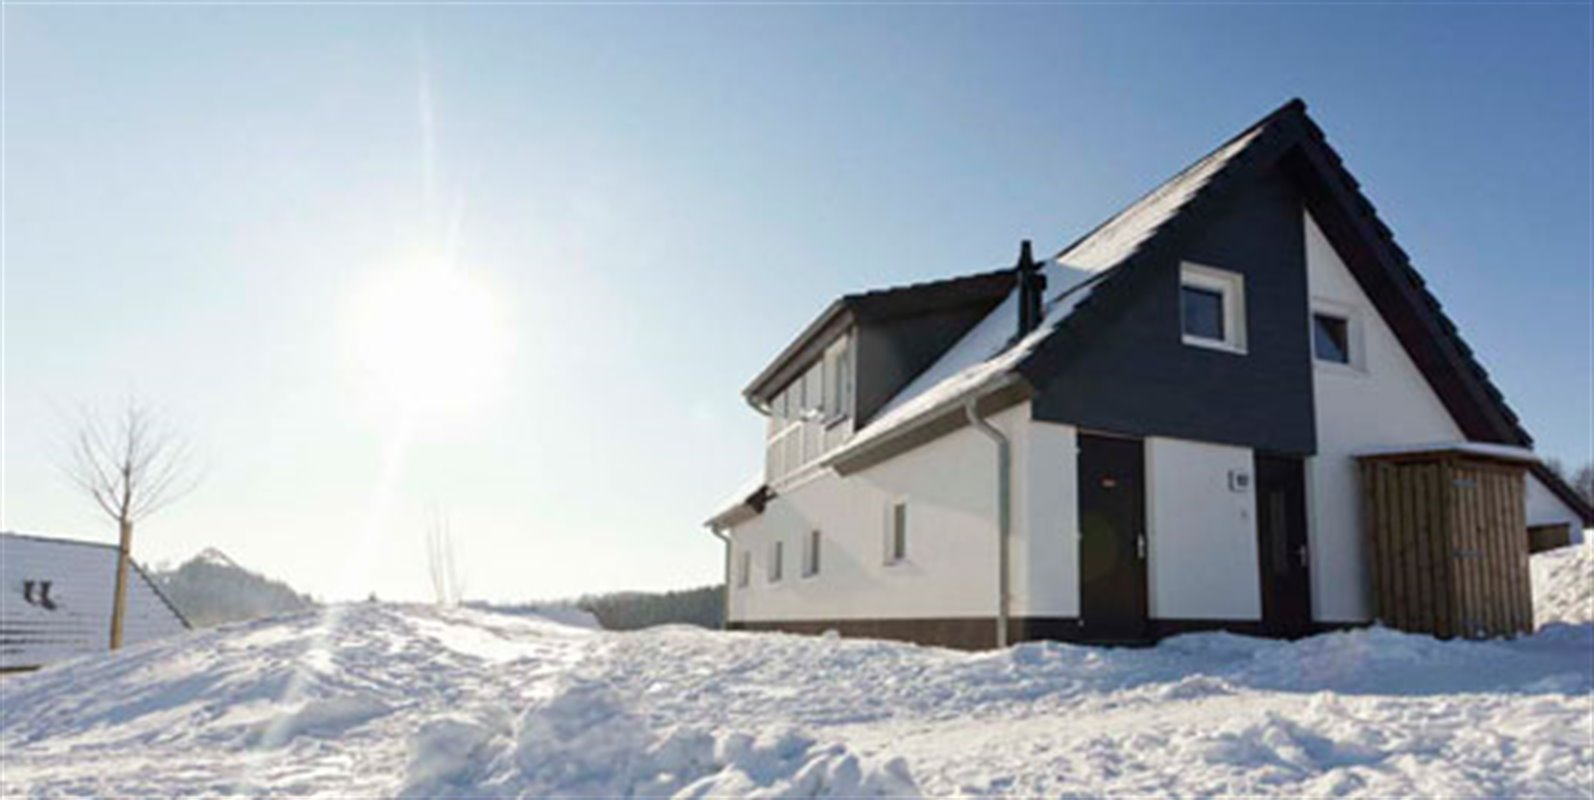 Landal Winterberg | 12-Pers.-Ferienhaus - Luxus...